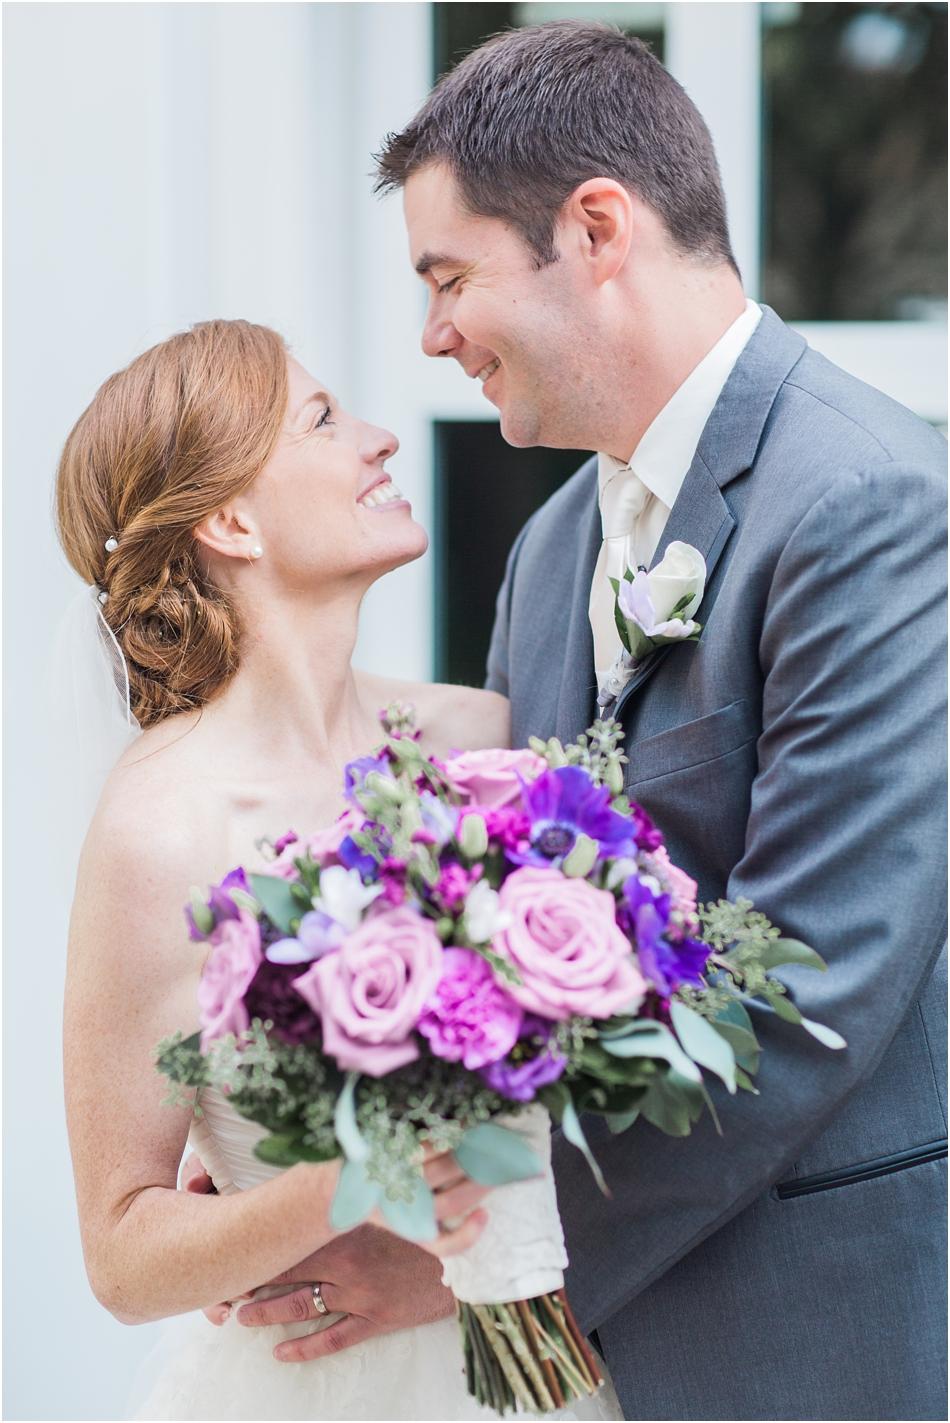 willowbend_megan_david_country_club_cape_cod_boston_new_england_wedding_photographer_Meredith_Jane_Photography_photo_0191.jpg